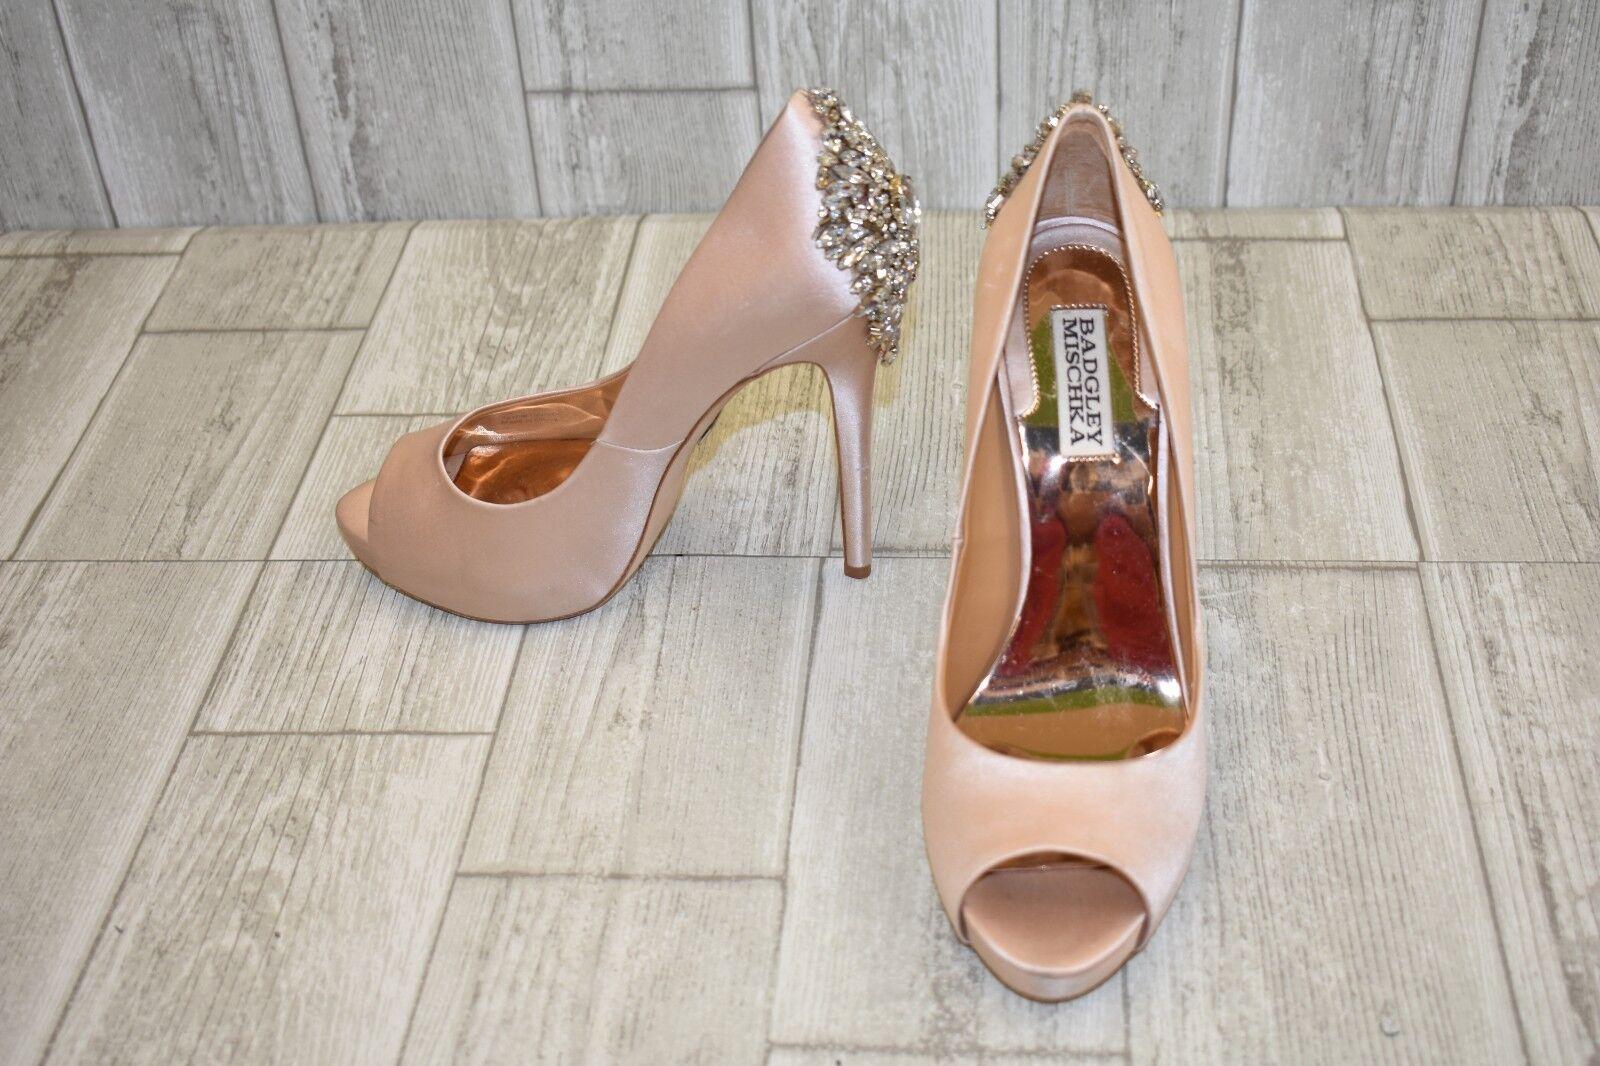 Badgley Mischka Kiara Crystal Embellished Platform Pumps-Women's size 8.5 M Pink